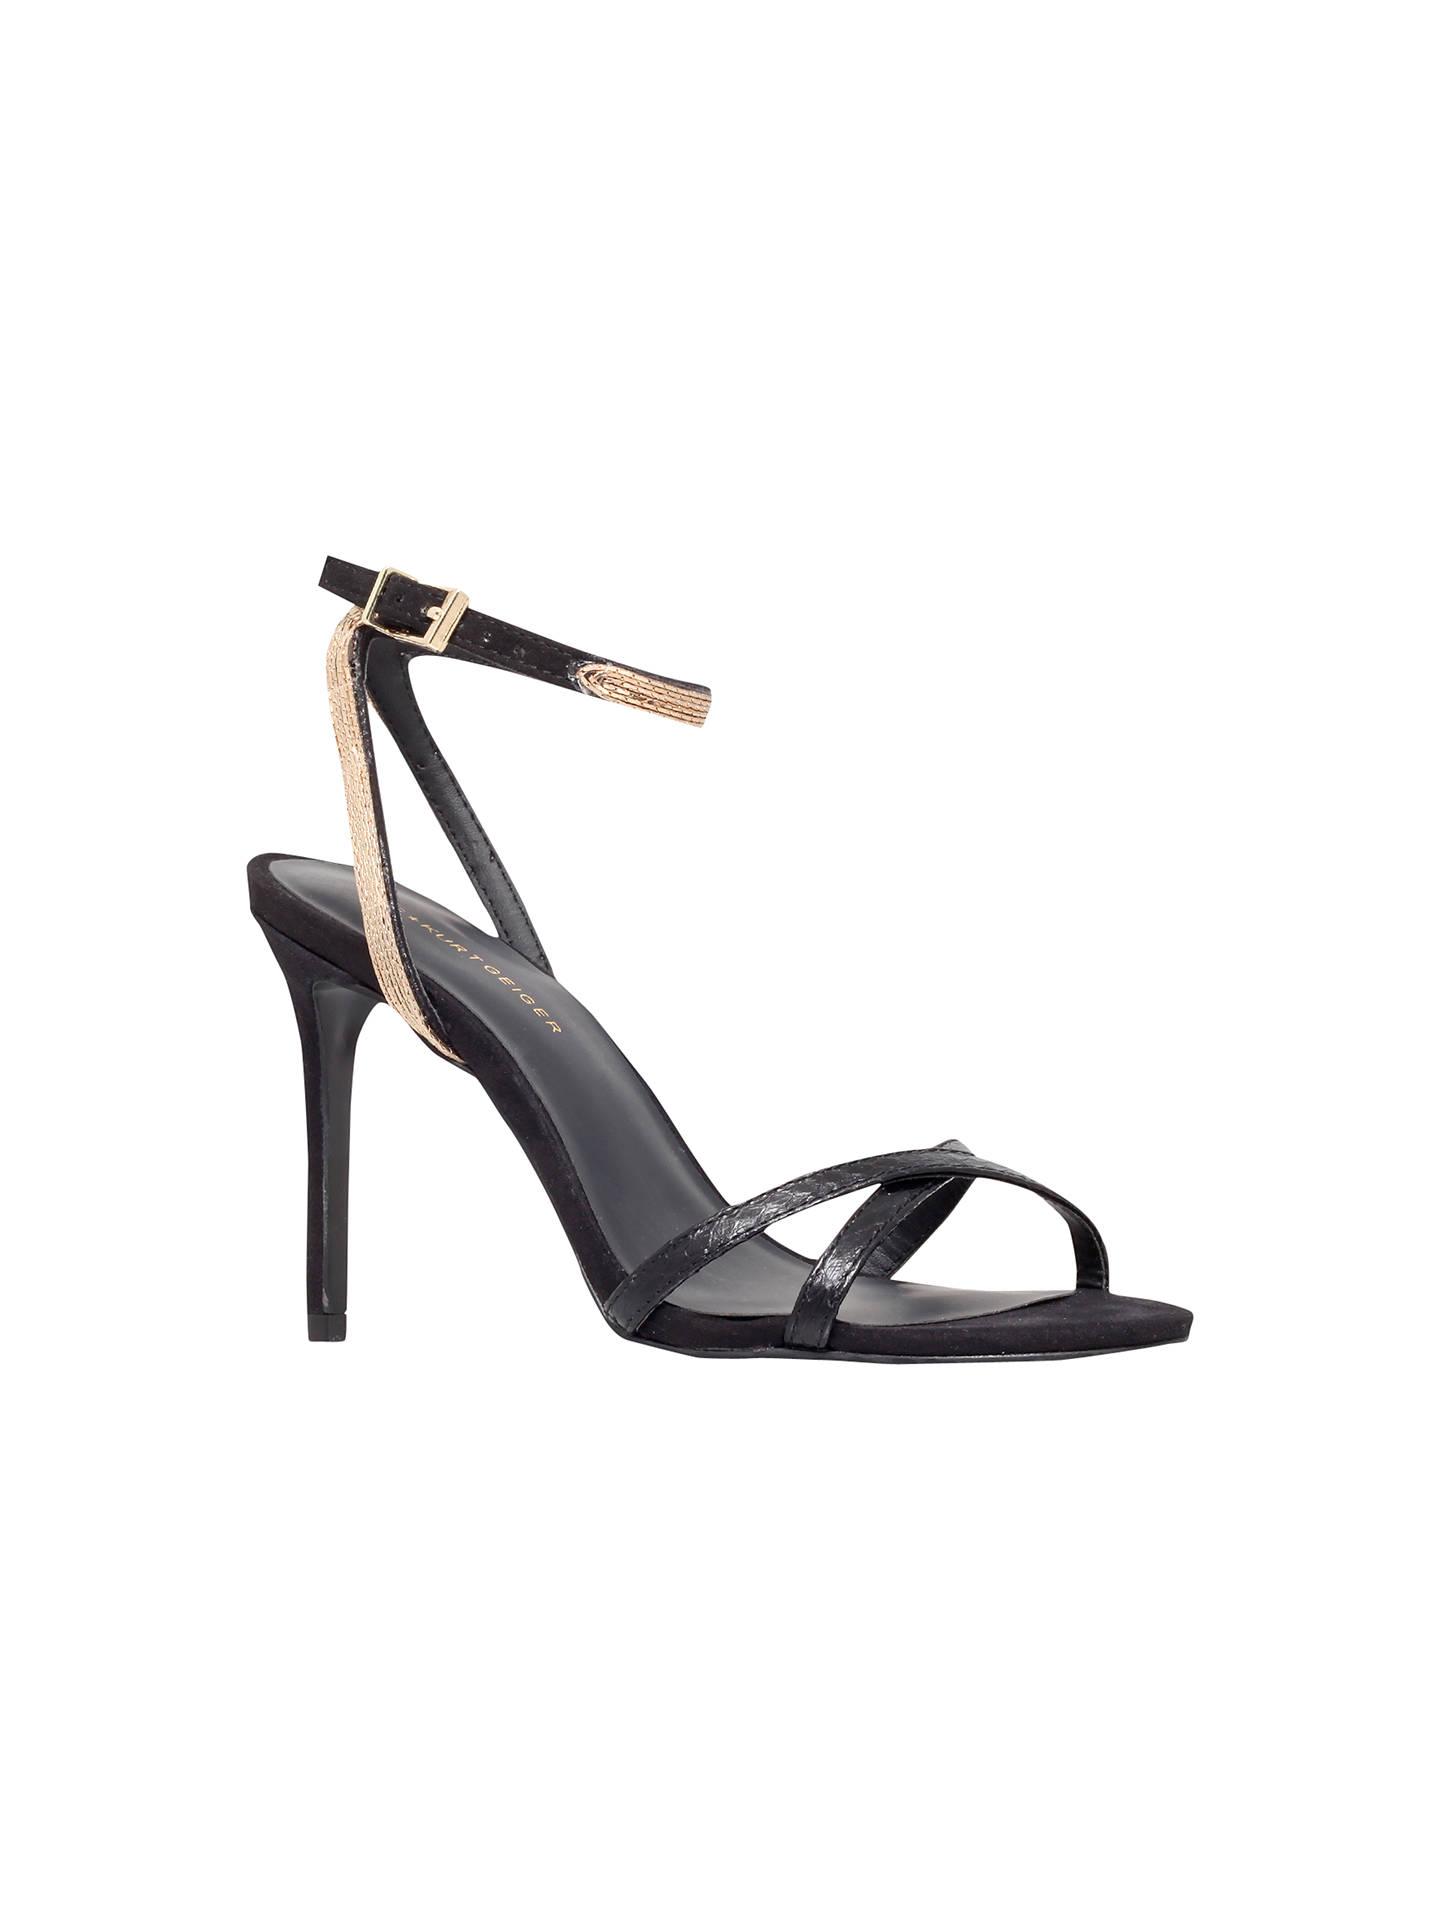 KG by Kurt Geiger Nutty Studded Block Heeled Sandals